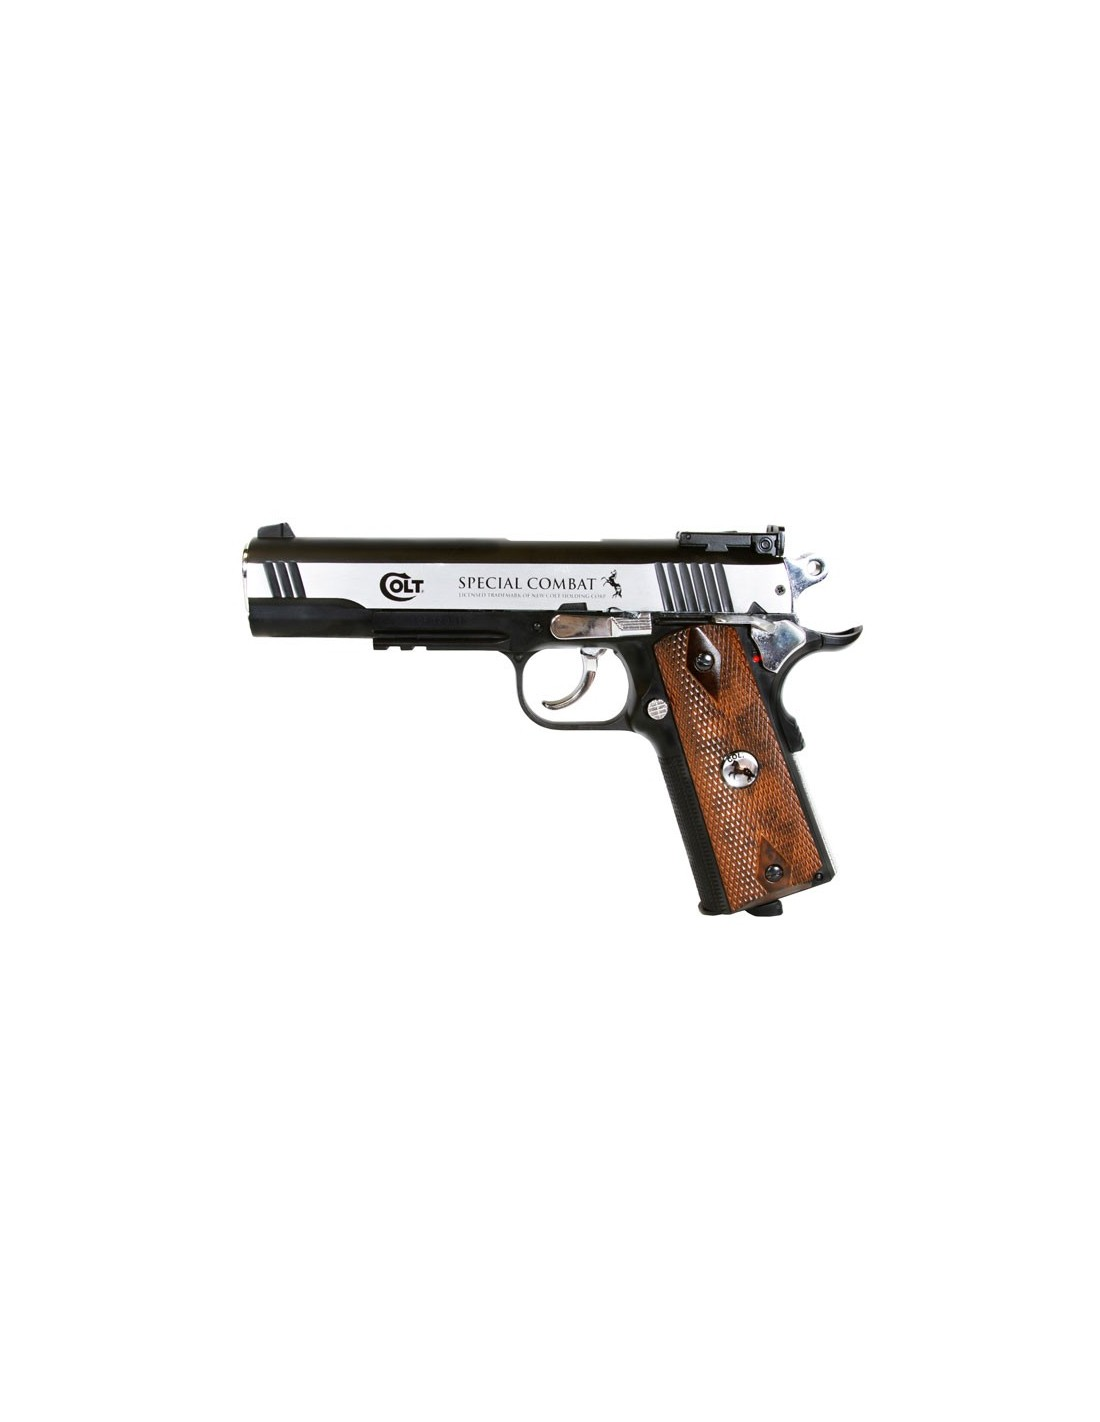 Pistola Colt 1911 Special Combat Classic CO2 de Postas